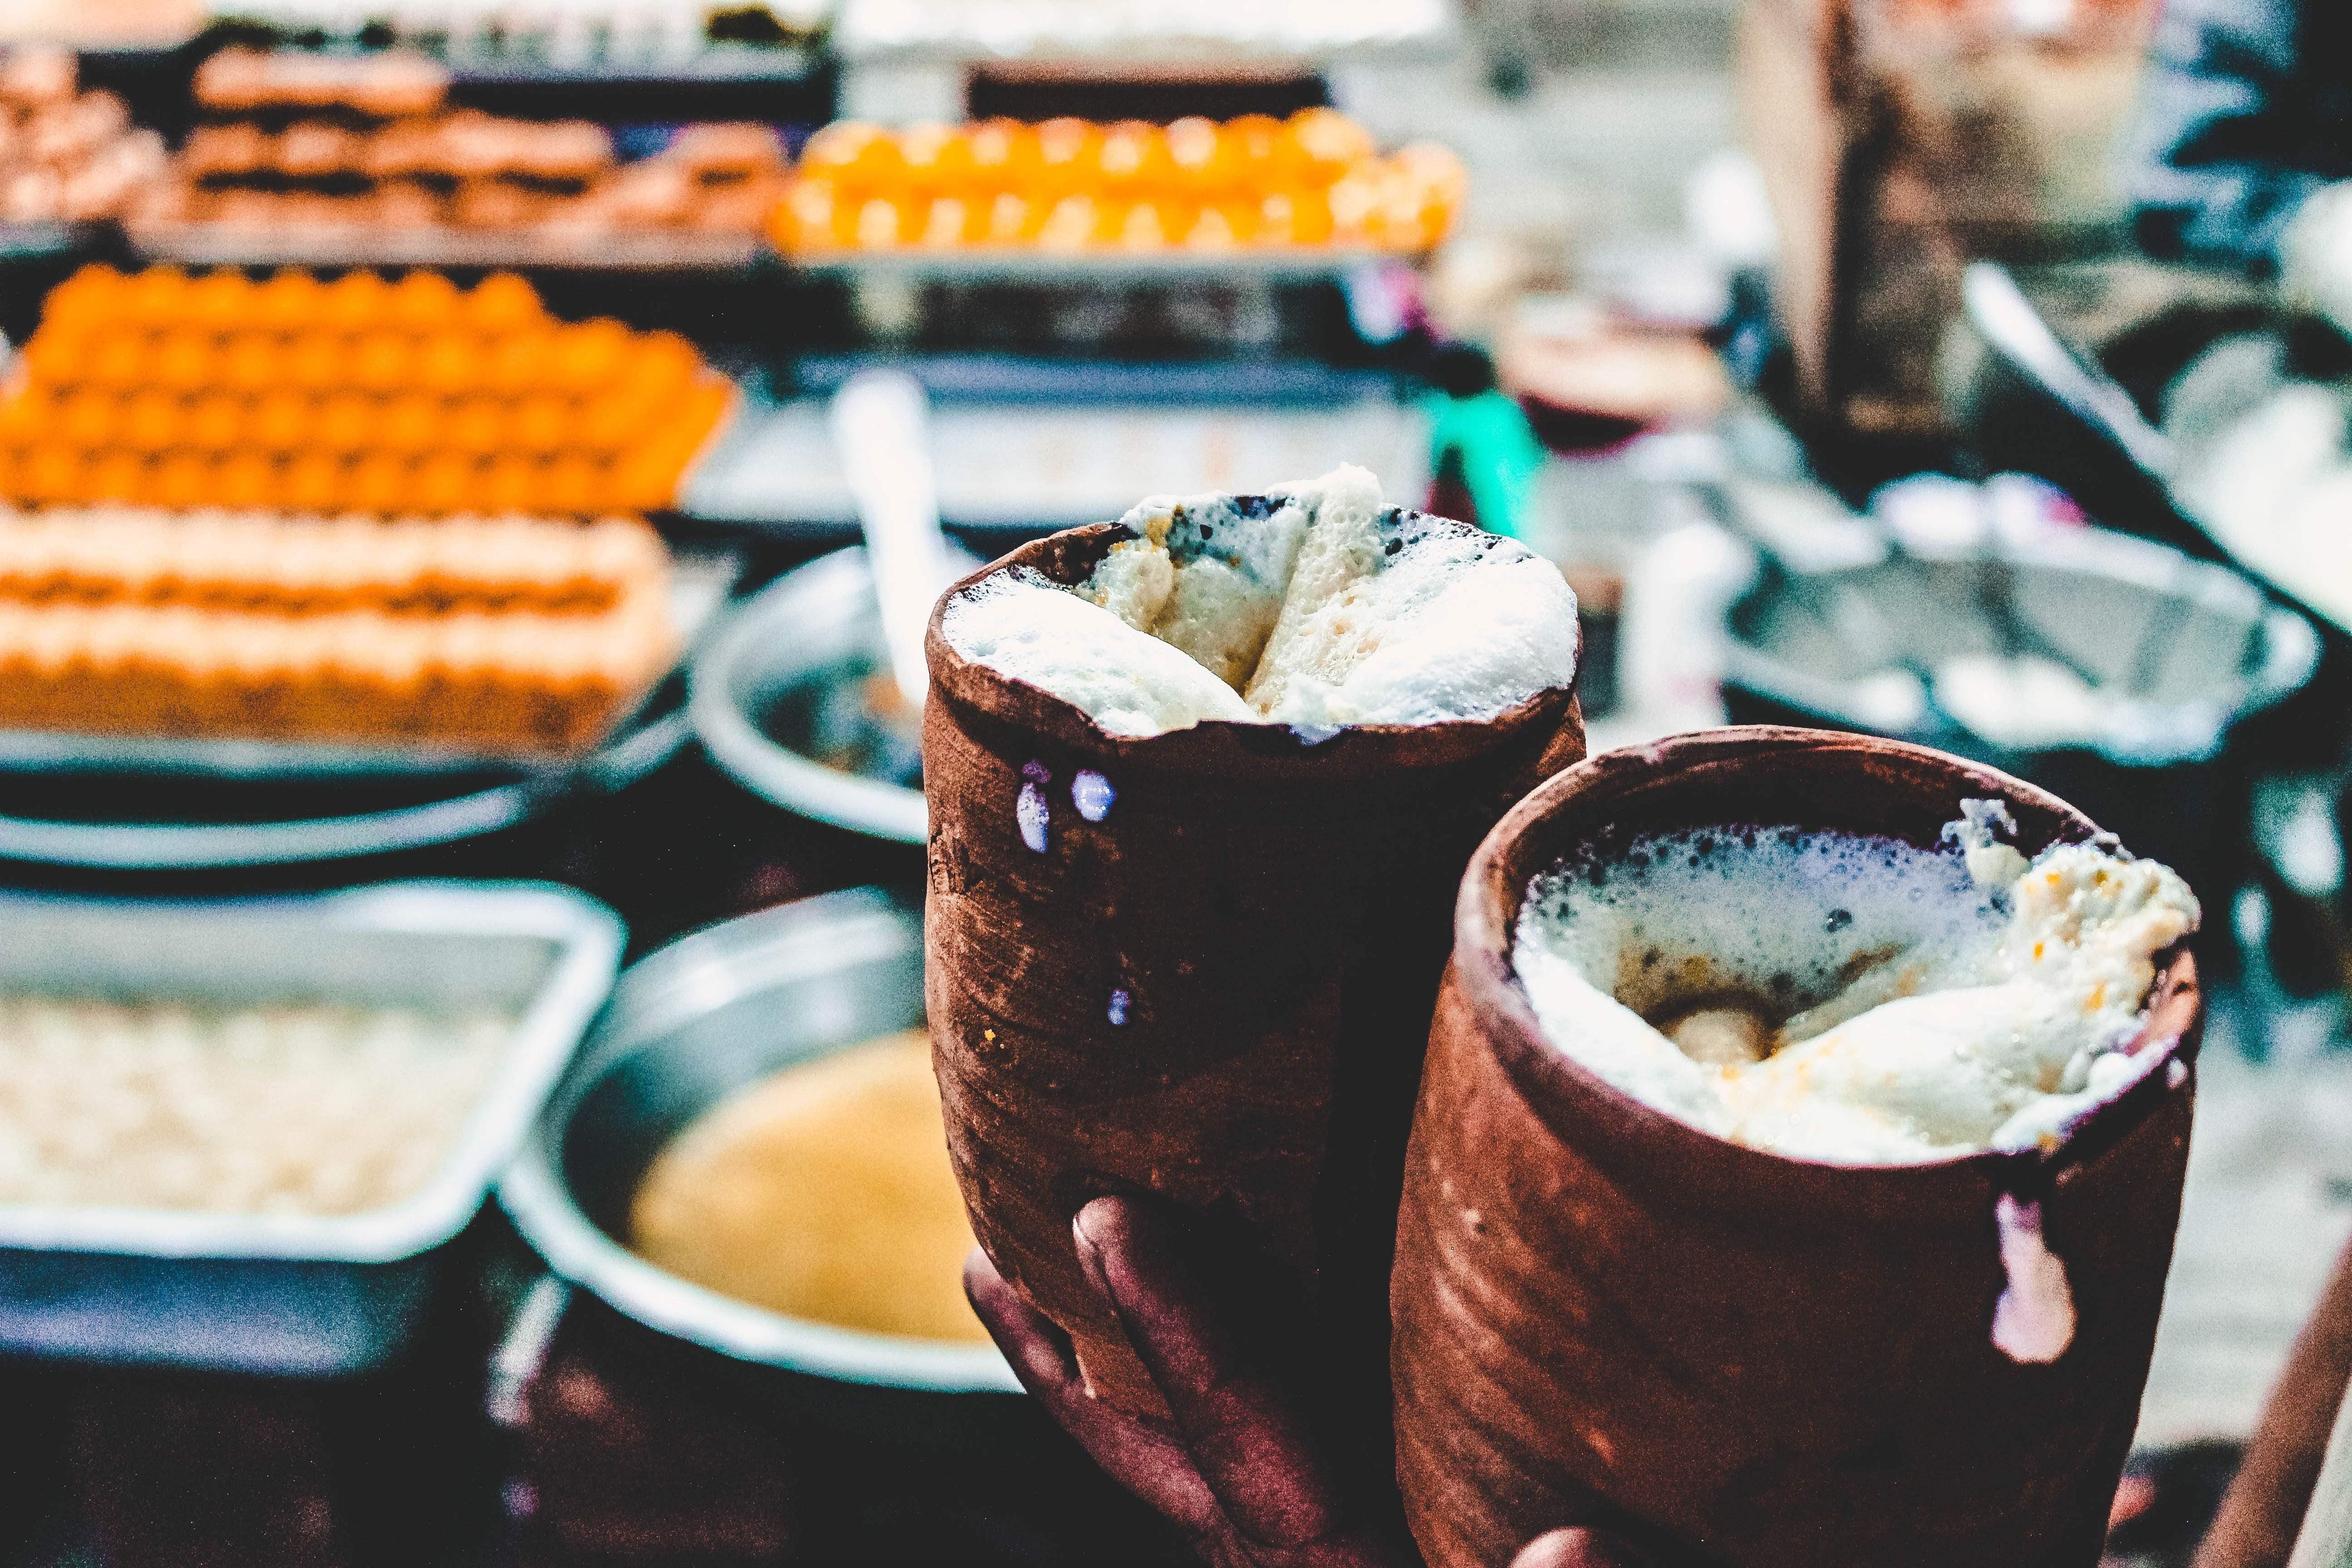 Food,Cuisine,Dish,Sweetness,Dessert,Comfort food,Drink,Table,Ingredient,Coffee